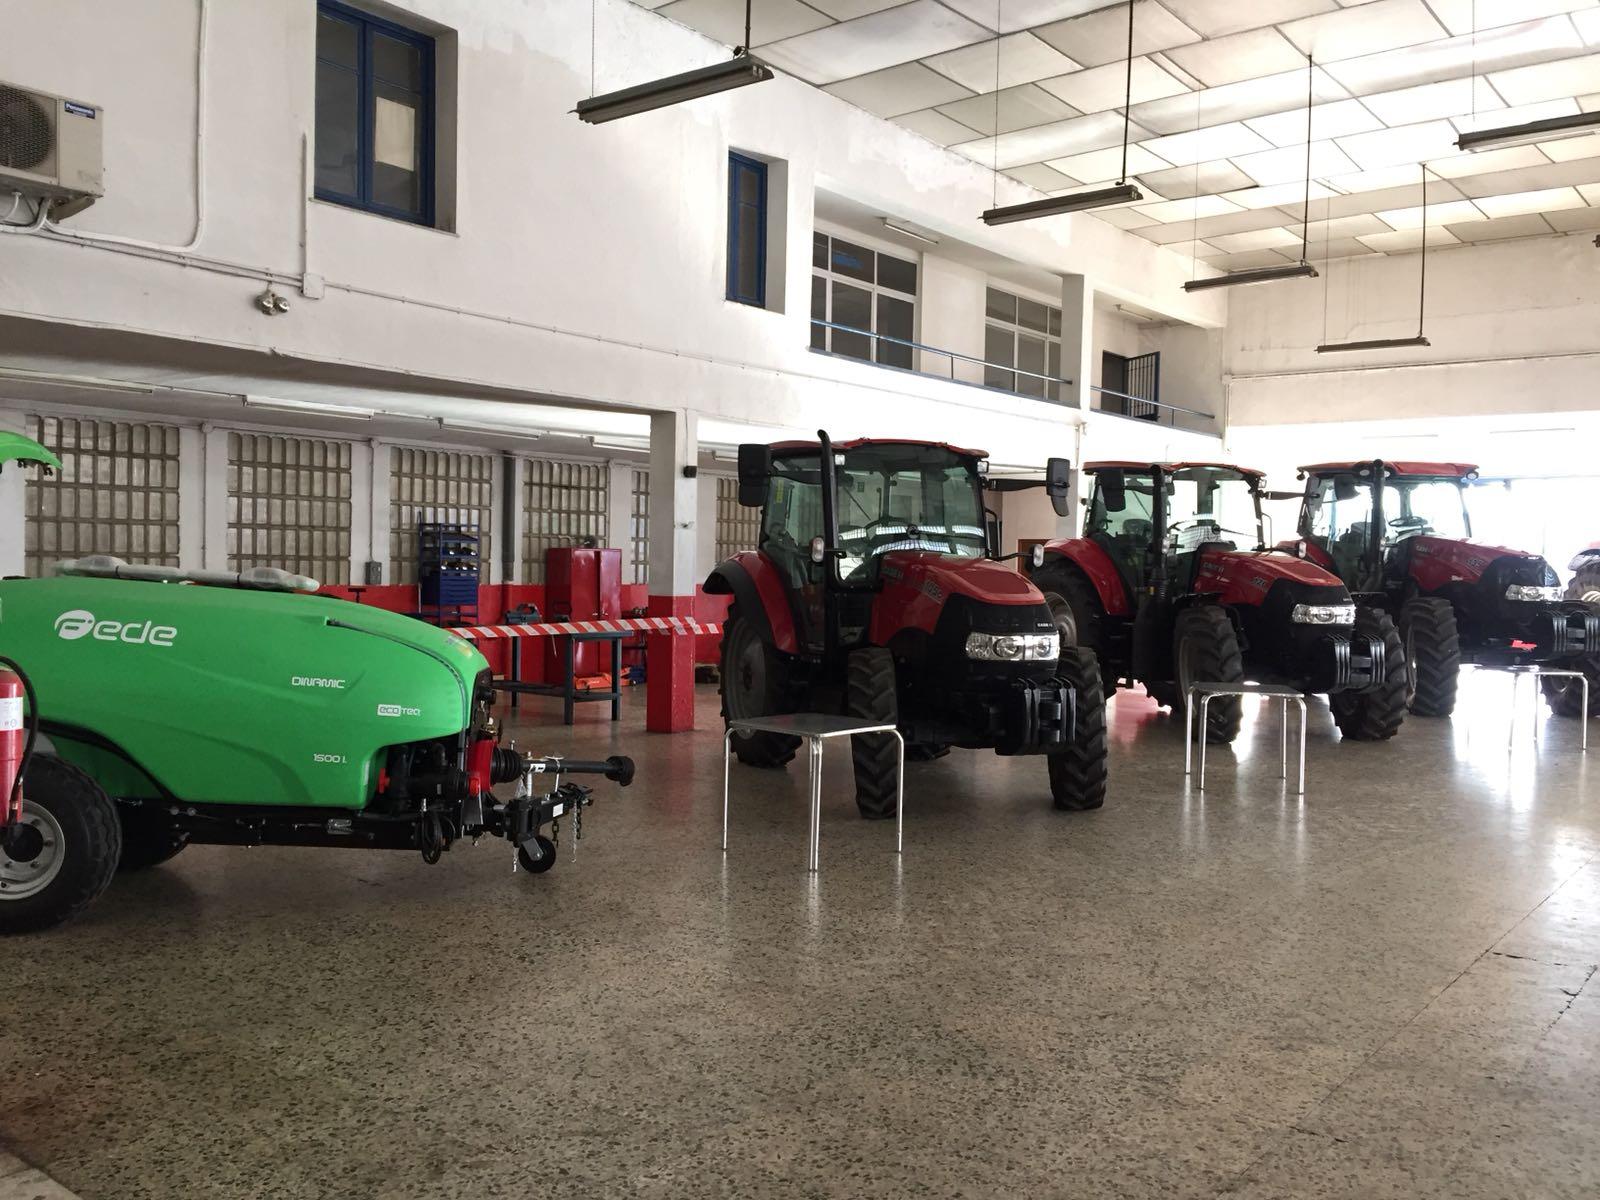 MecoTrac | Mecánica agrícola y turismo